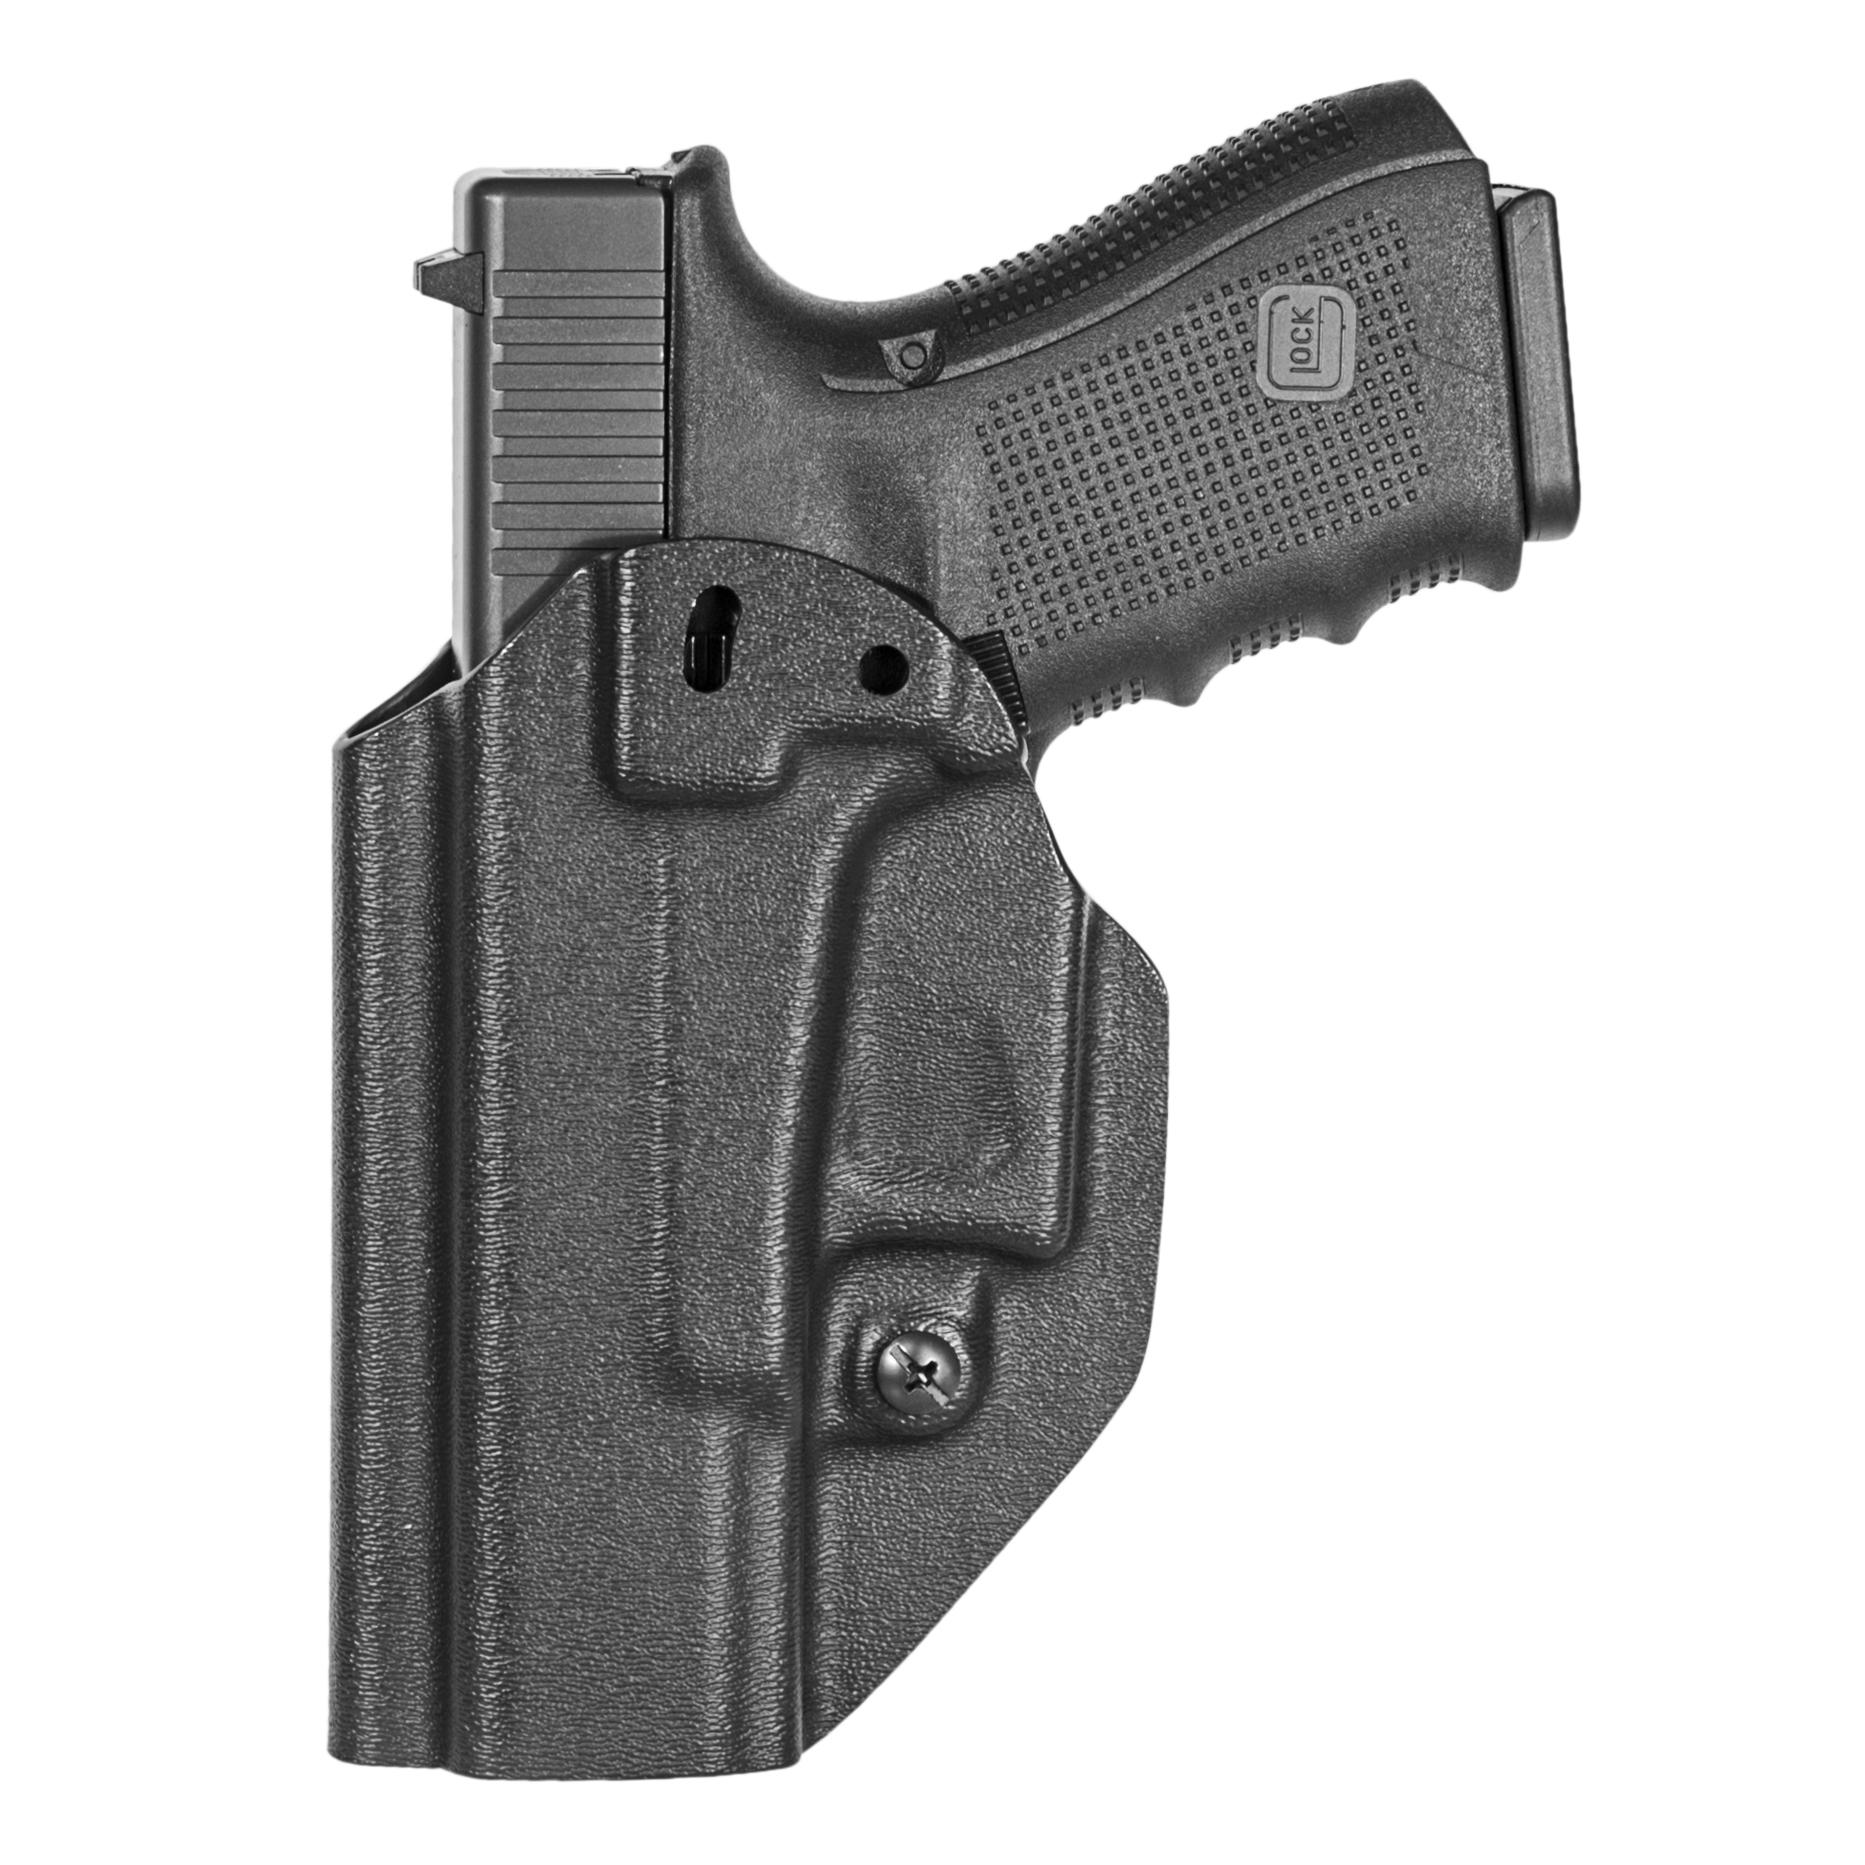 Mission First Tactical IWB Handgun Holster | Gander Outdoors